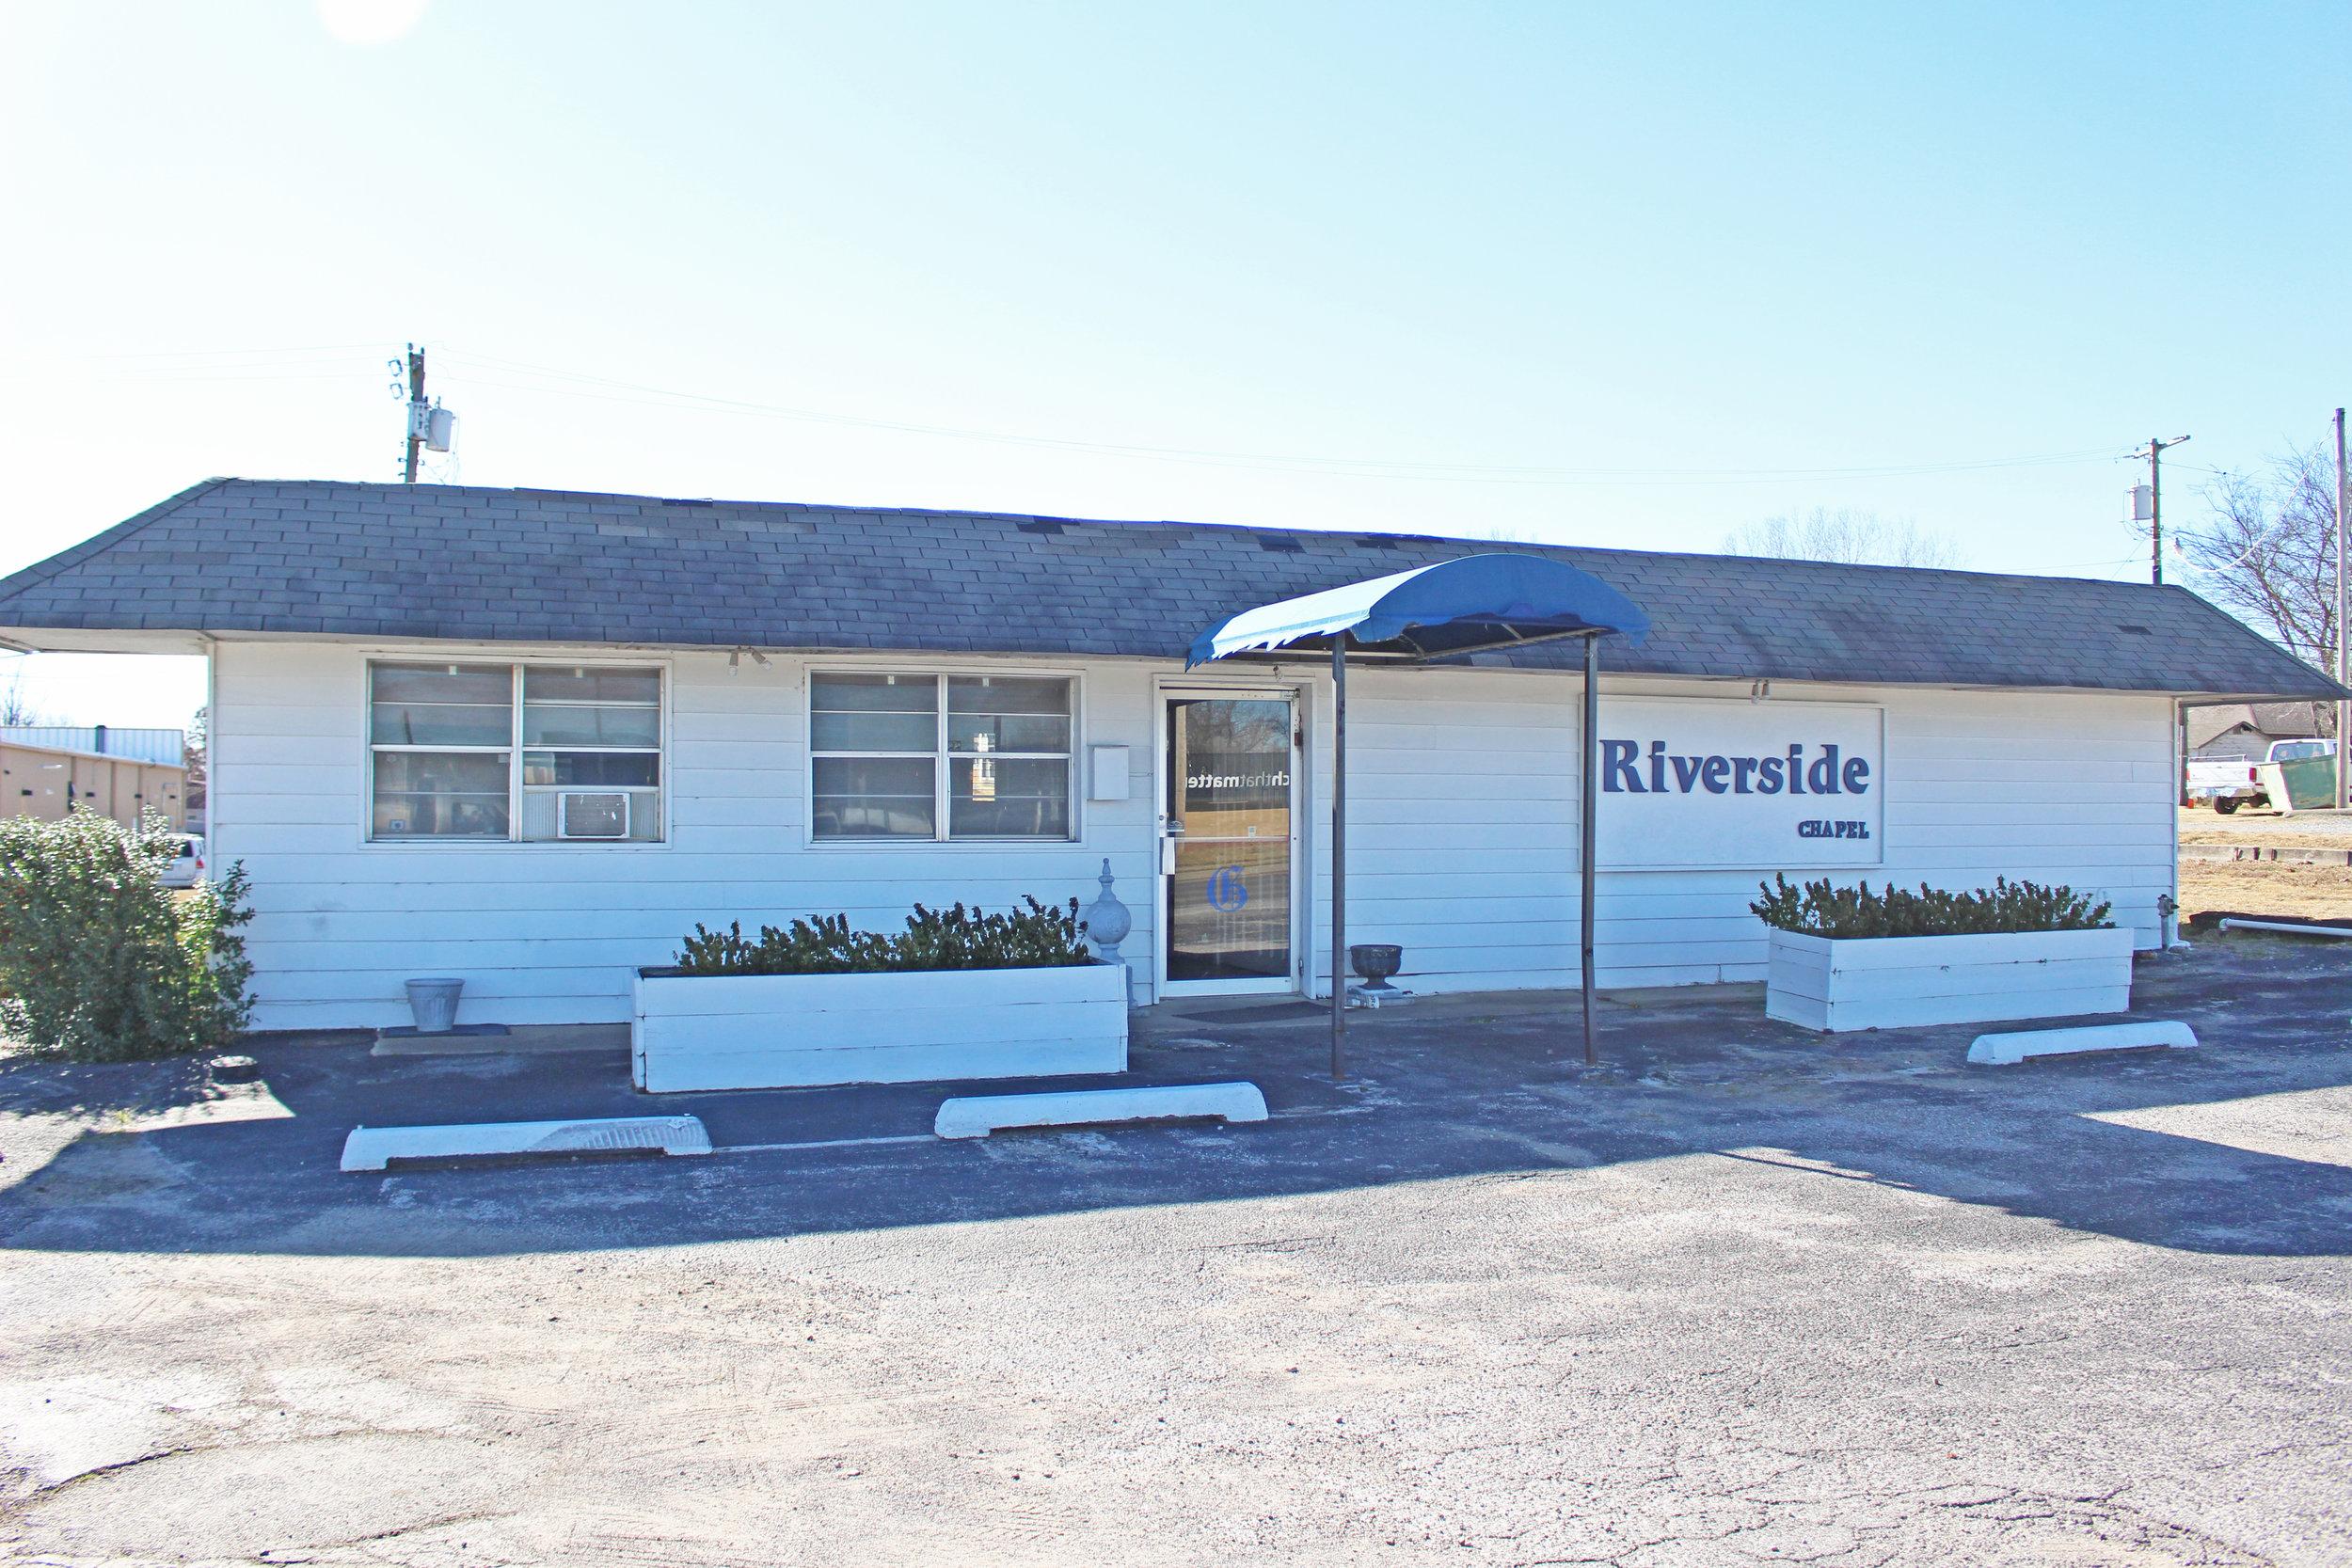 mark griffith memorial funeral home: Riverside chapel - prattville 4 west 41st street